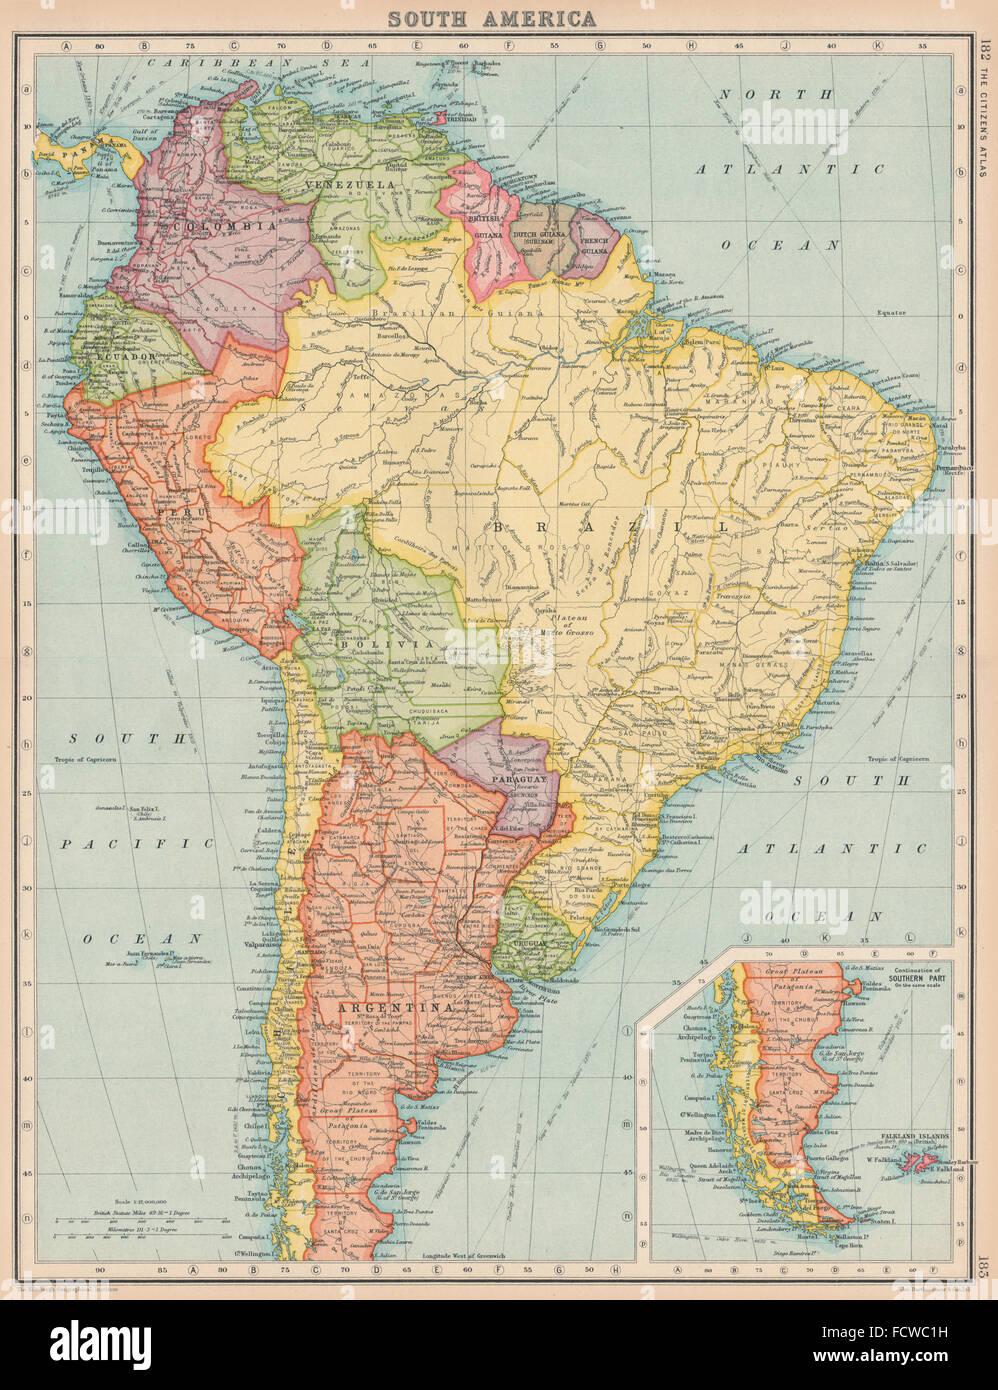 South America Political Bartholomew 1924 Vintage Map Stock Photo